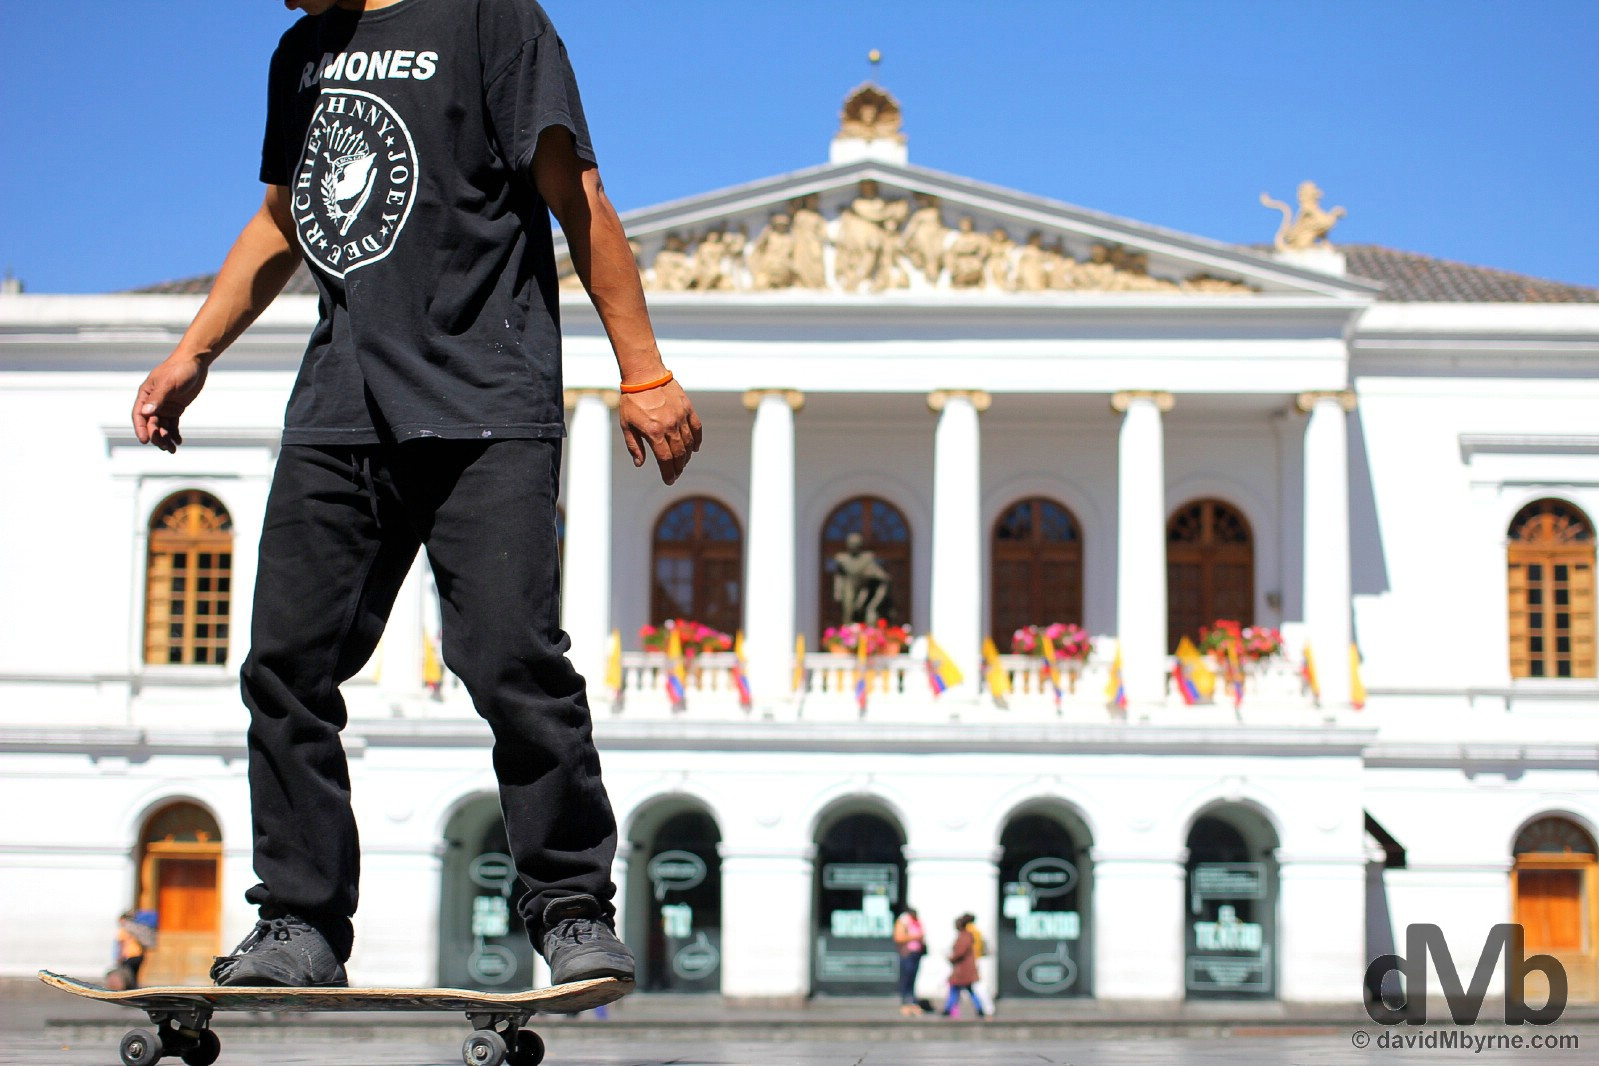 Plaza del Teatro in Quito, Ecuador. July 3, 2015.